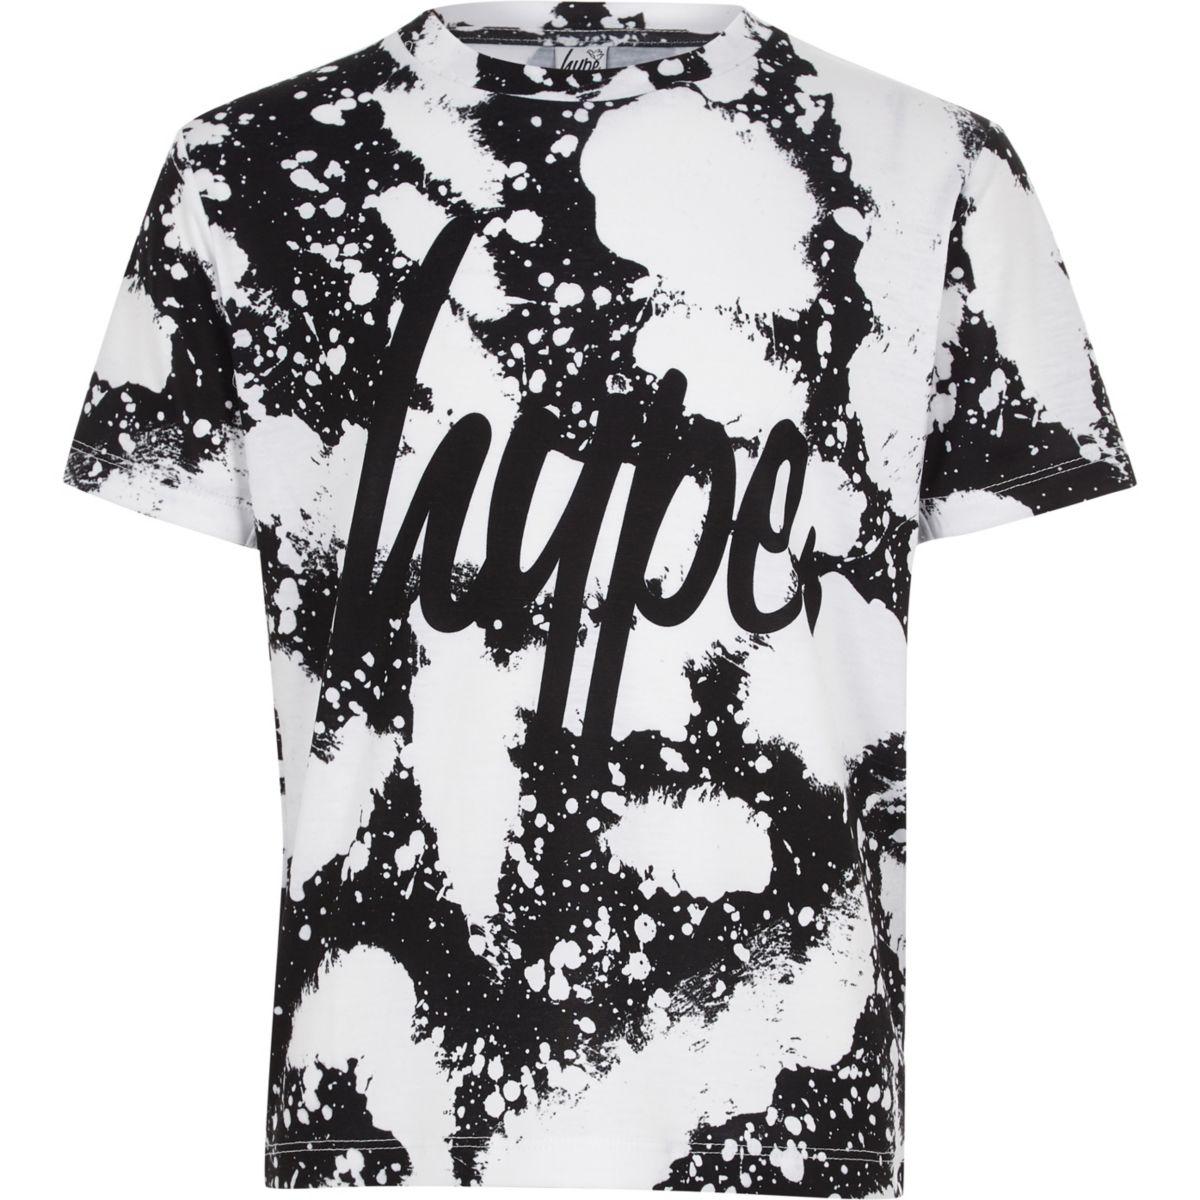 Boys Hype white paint splat T-shirt